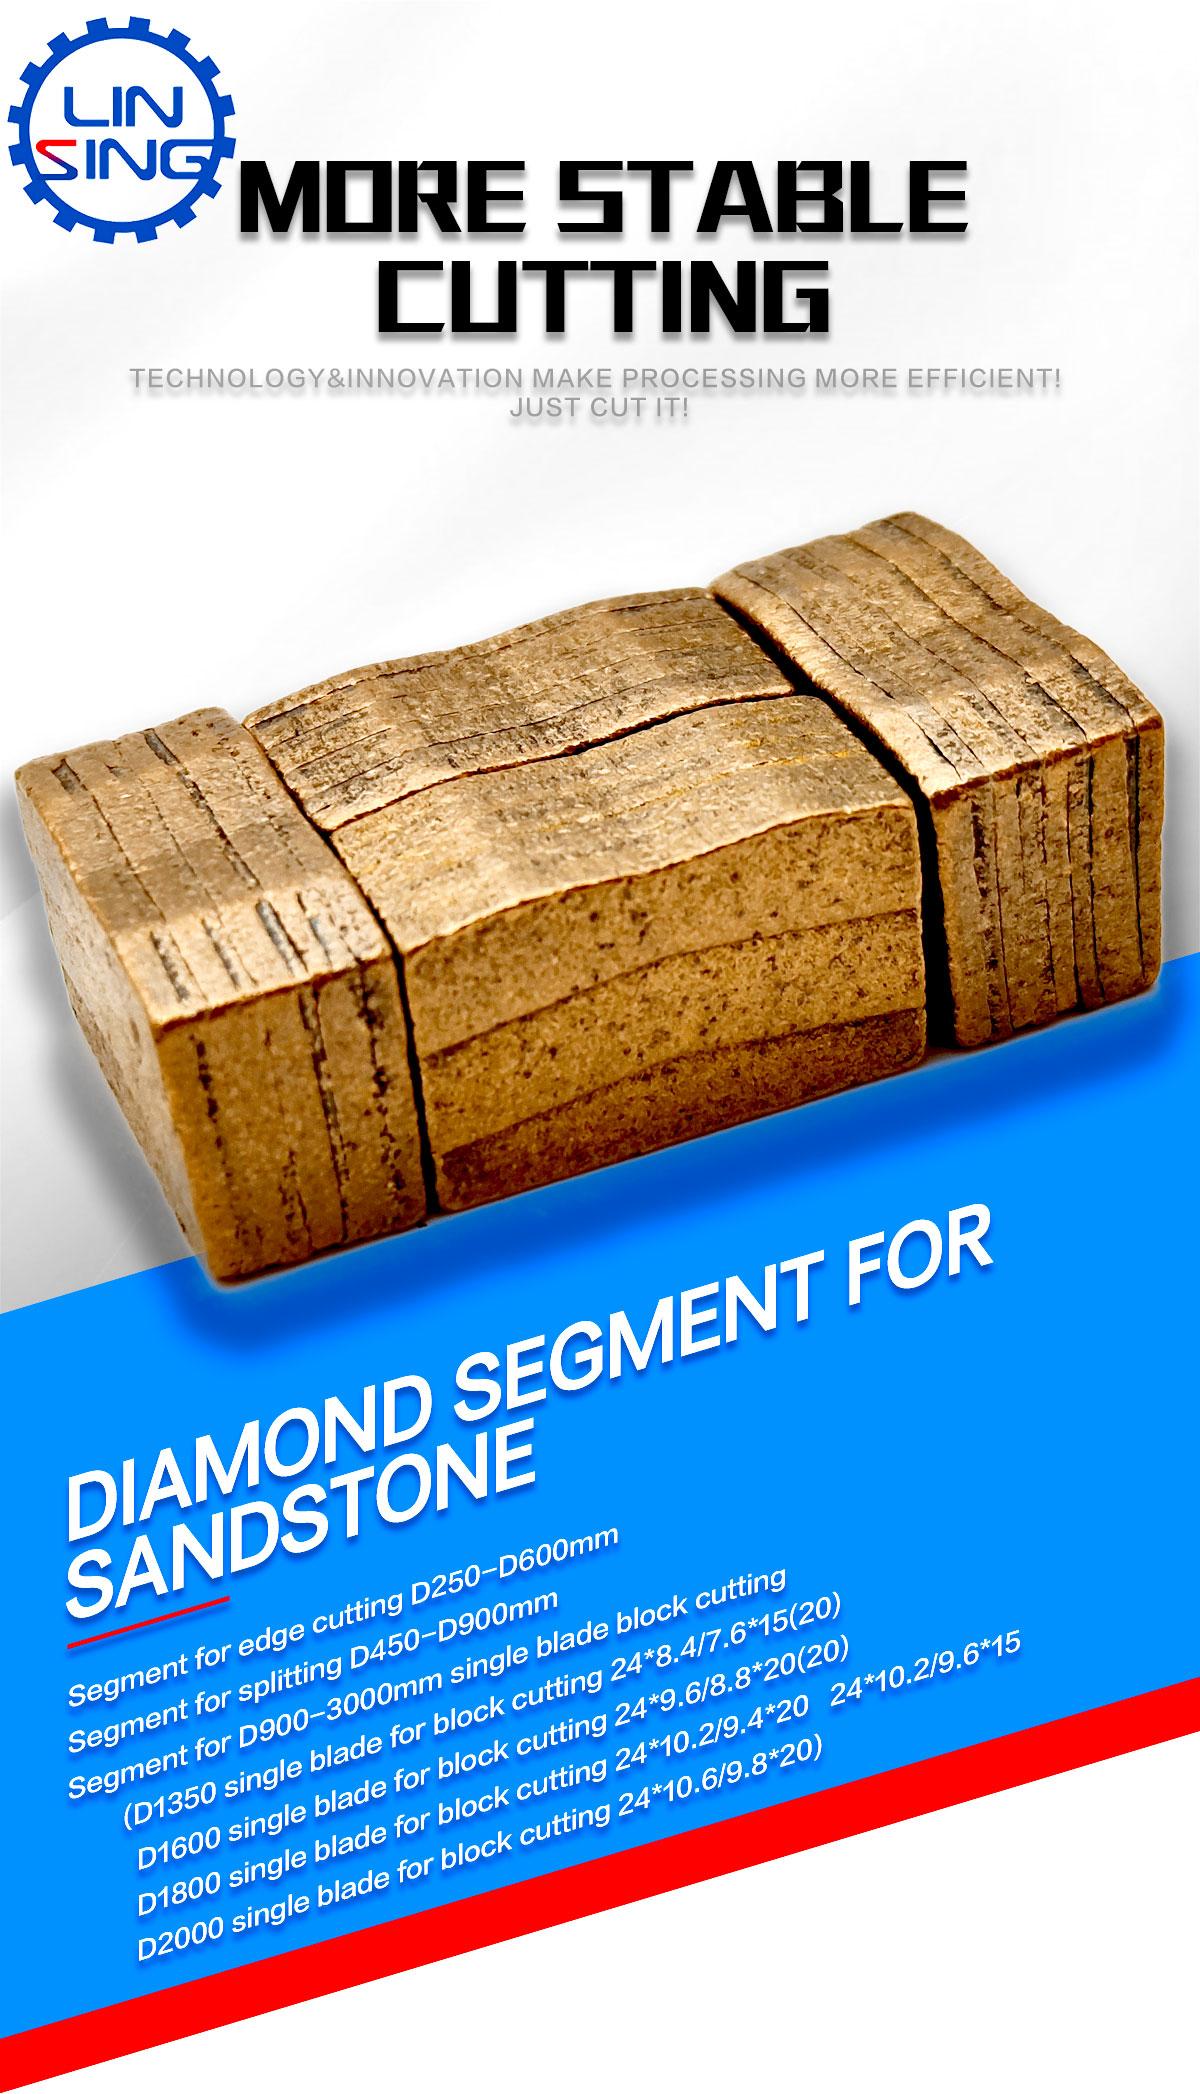 diamond segments for sandstone block cutting